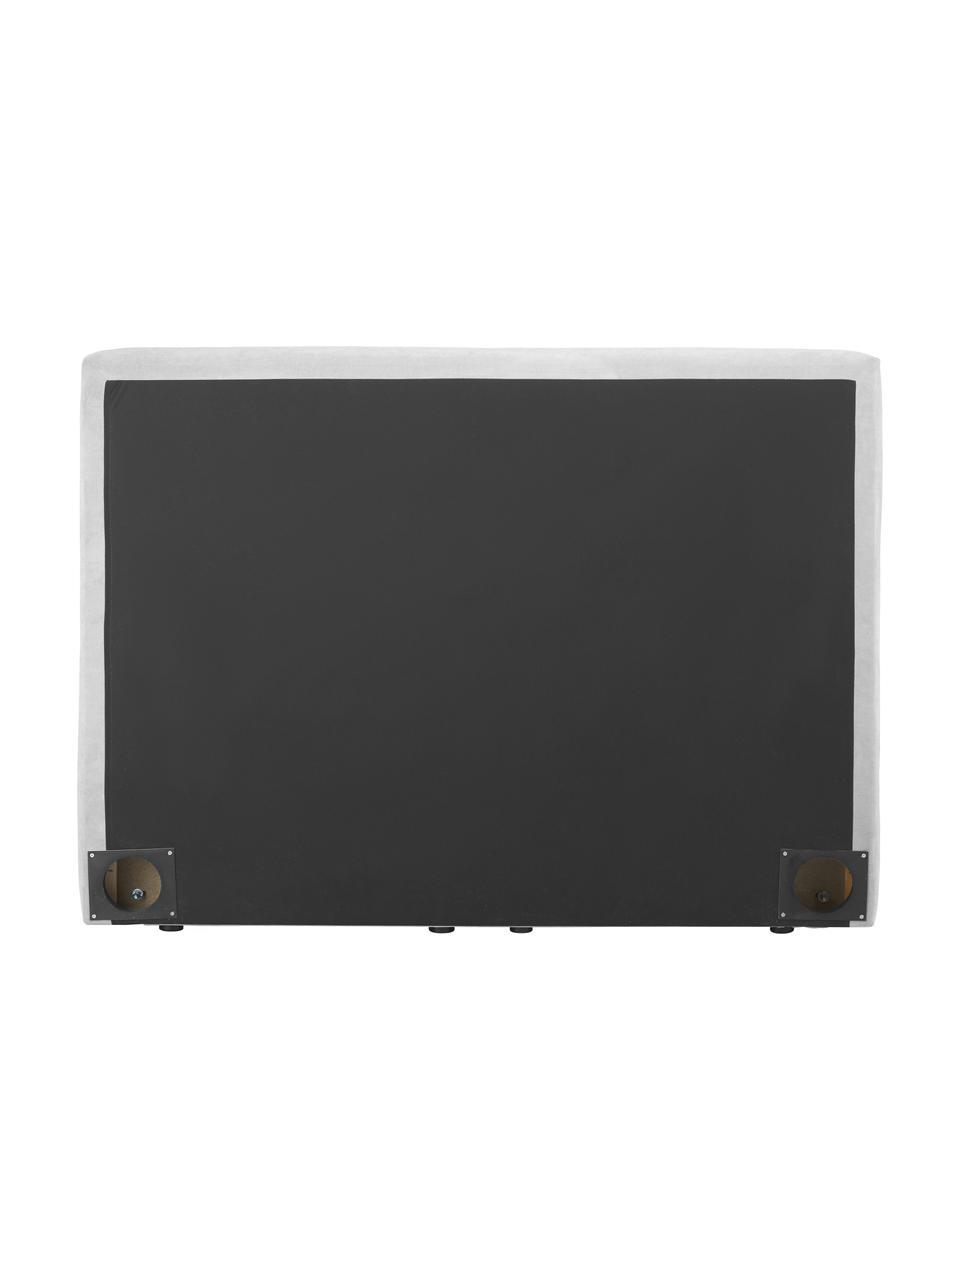 Boxspring bed Oberon in lichtgrijs, Matras: 5-zones pocketvering, Poten: kunststof, Stof lichtgrijs, 200 x 200 cm